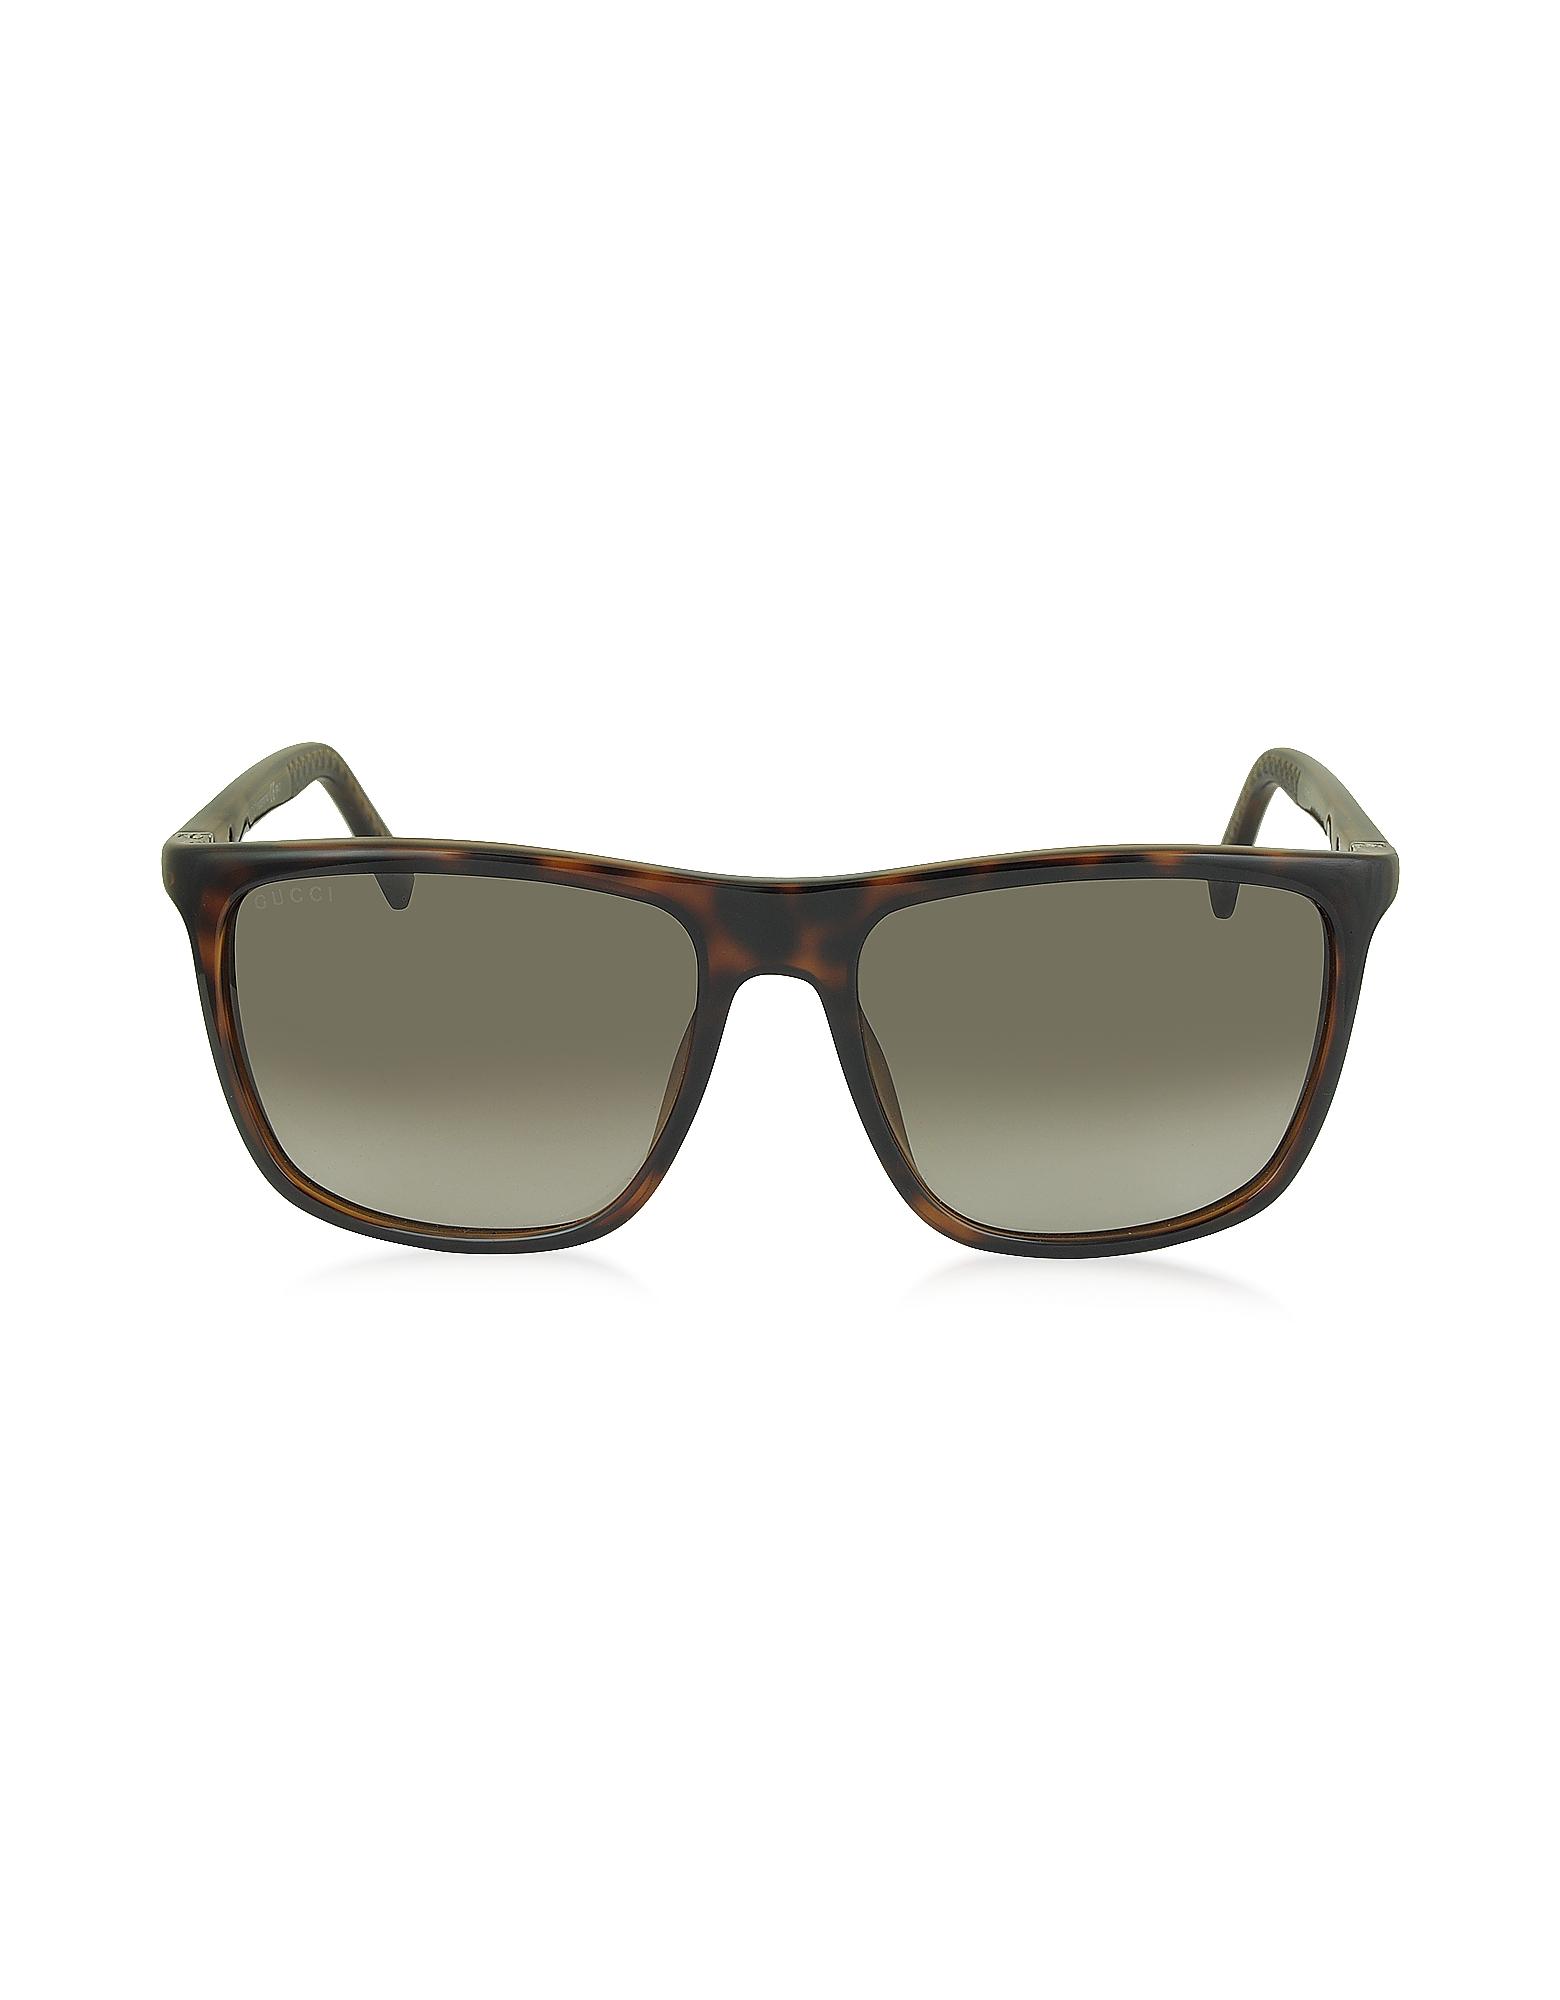 acfc107e5b Buy Gucci Women s Brown Gg 1132 s Dwjha Havana Acetate Square Frame Men s  Sunglasses